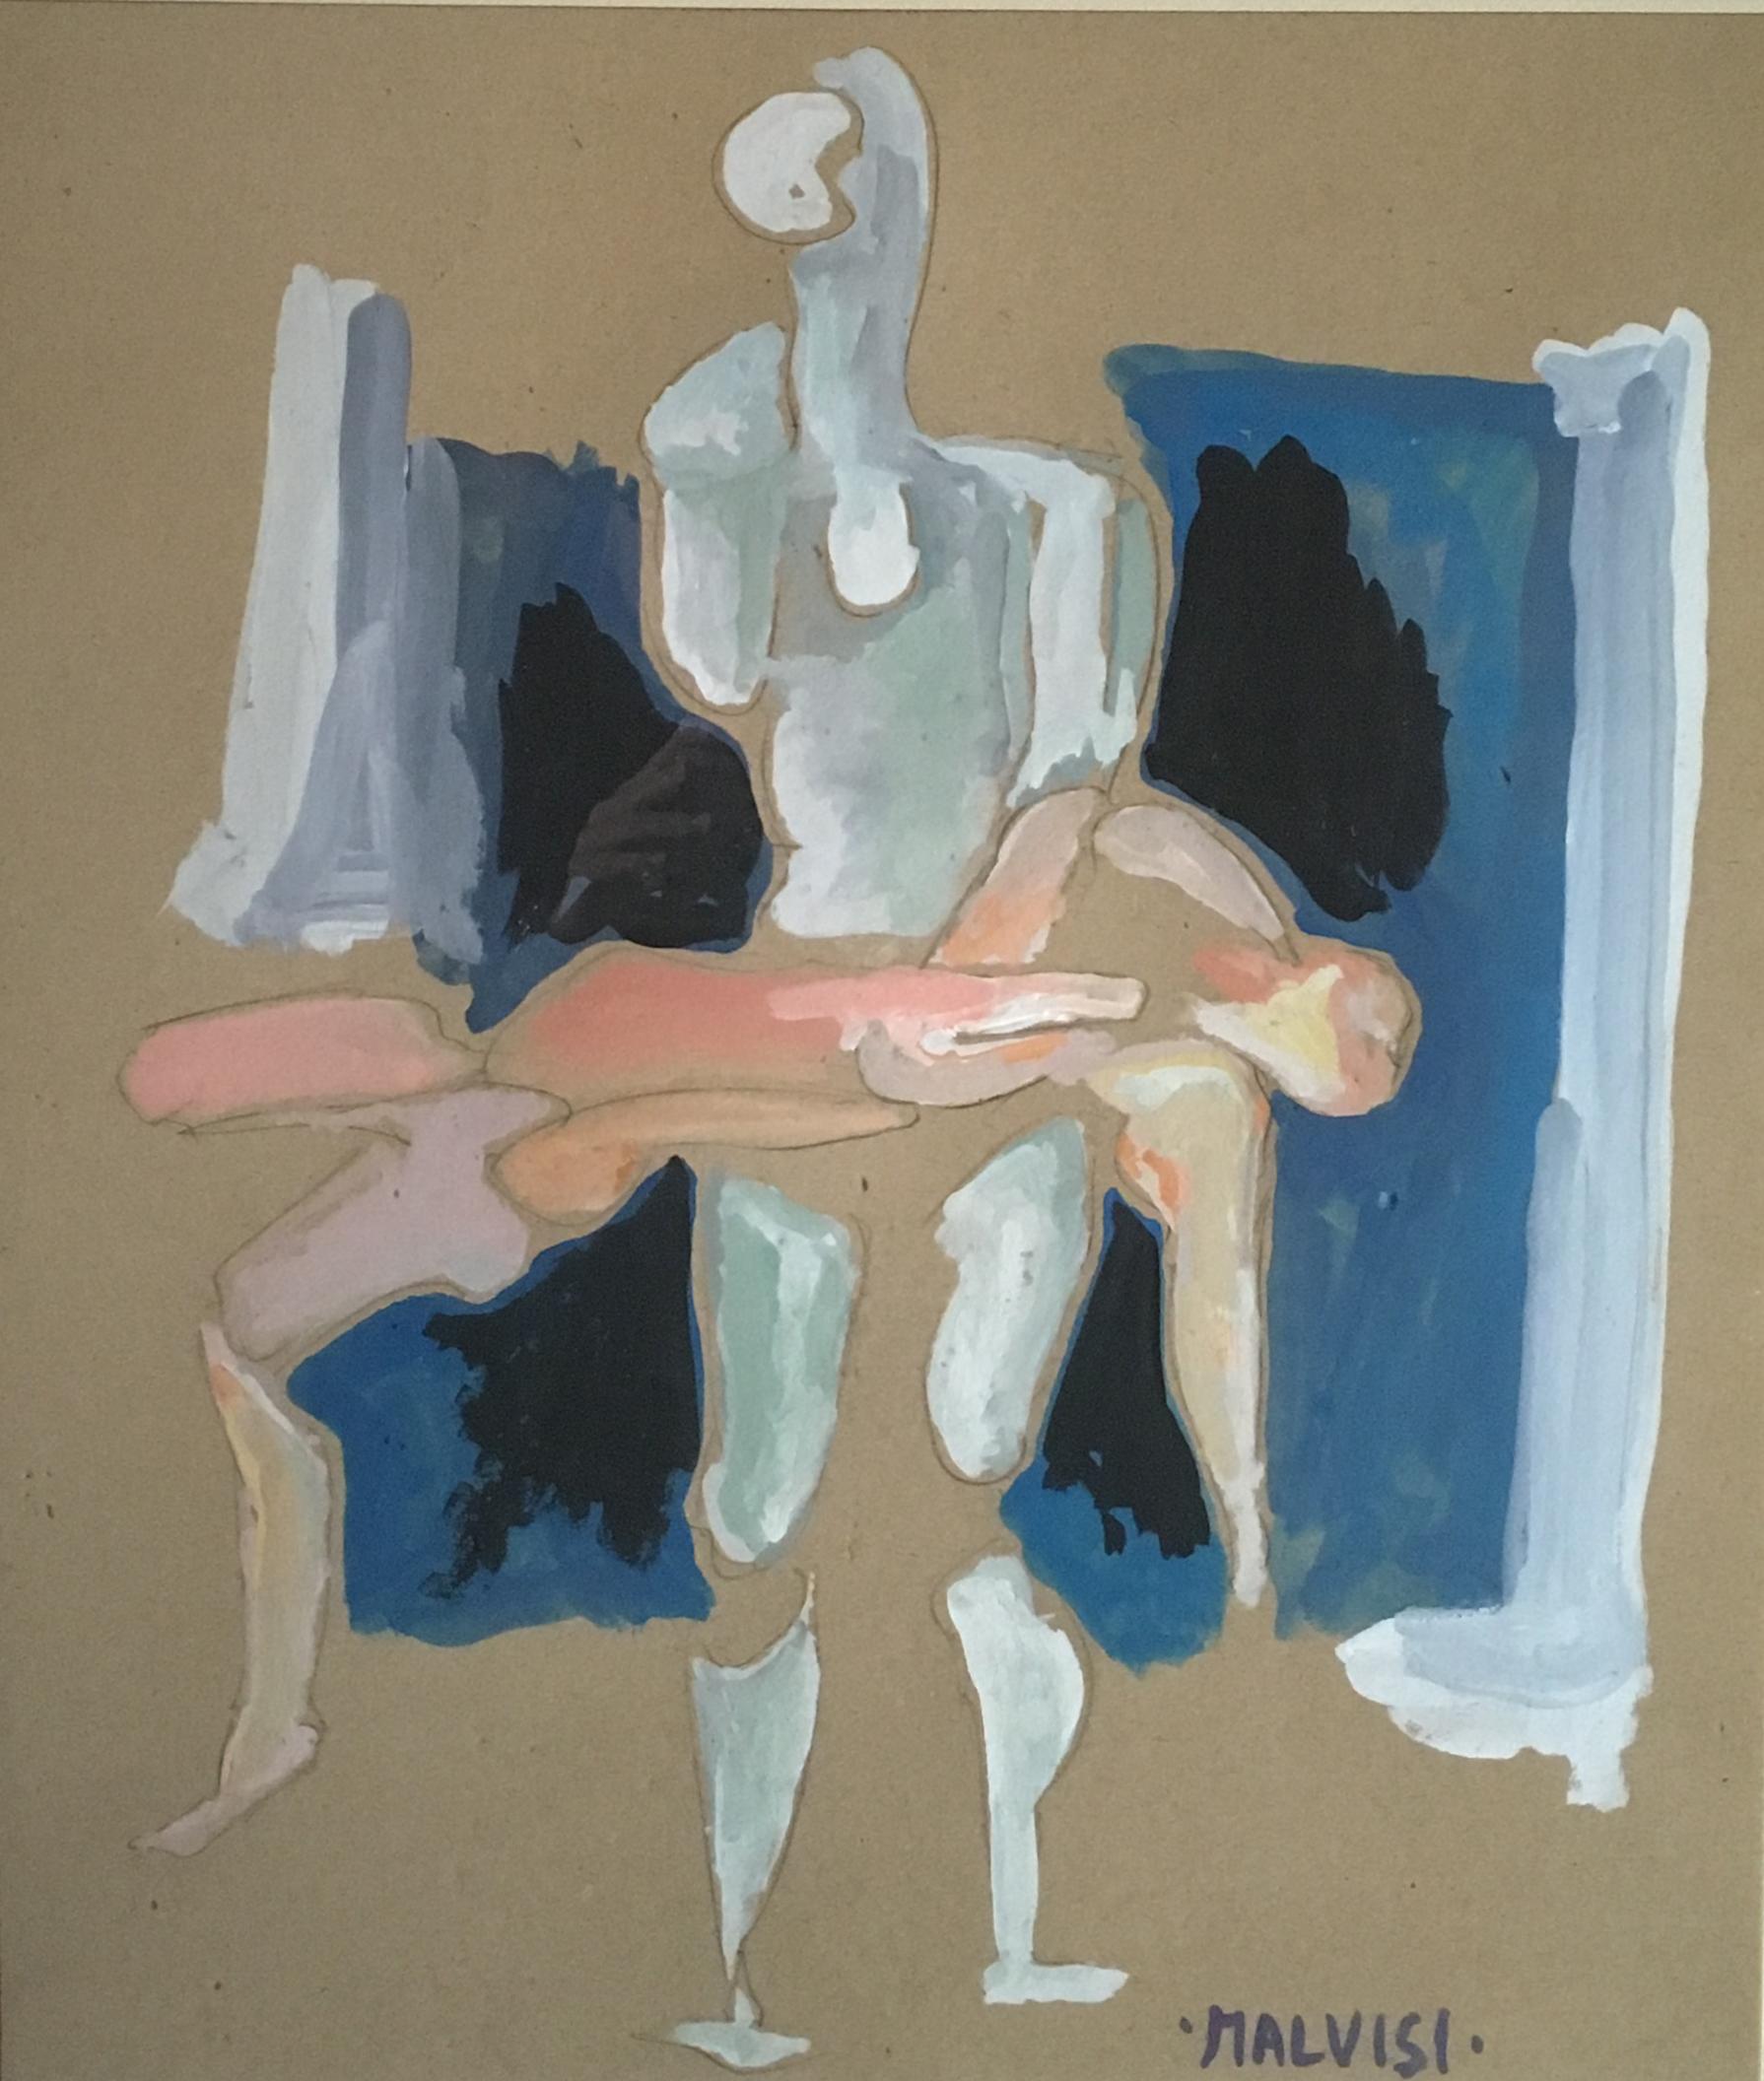 <b>Pietas</b> <br> 1995 Pencil and tempera, cm 47 x 58